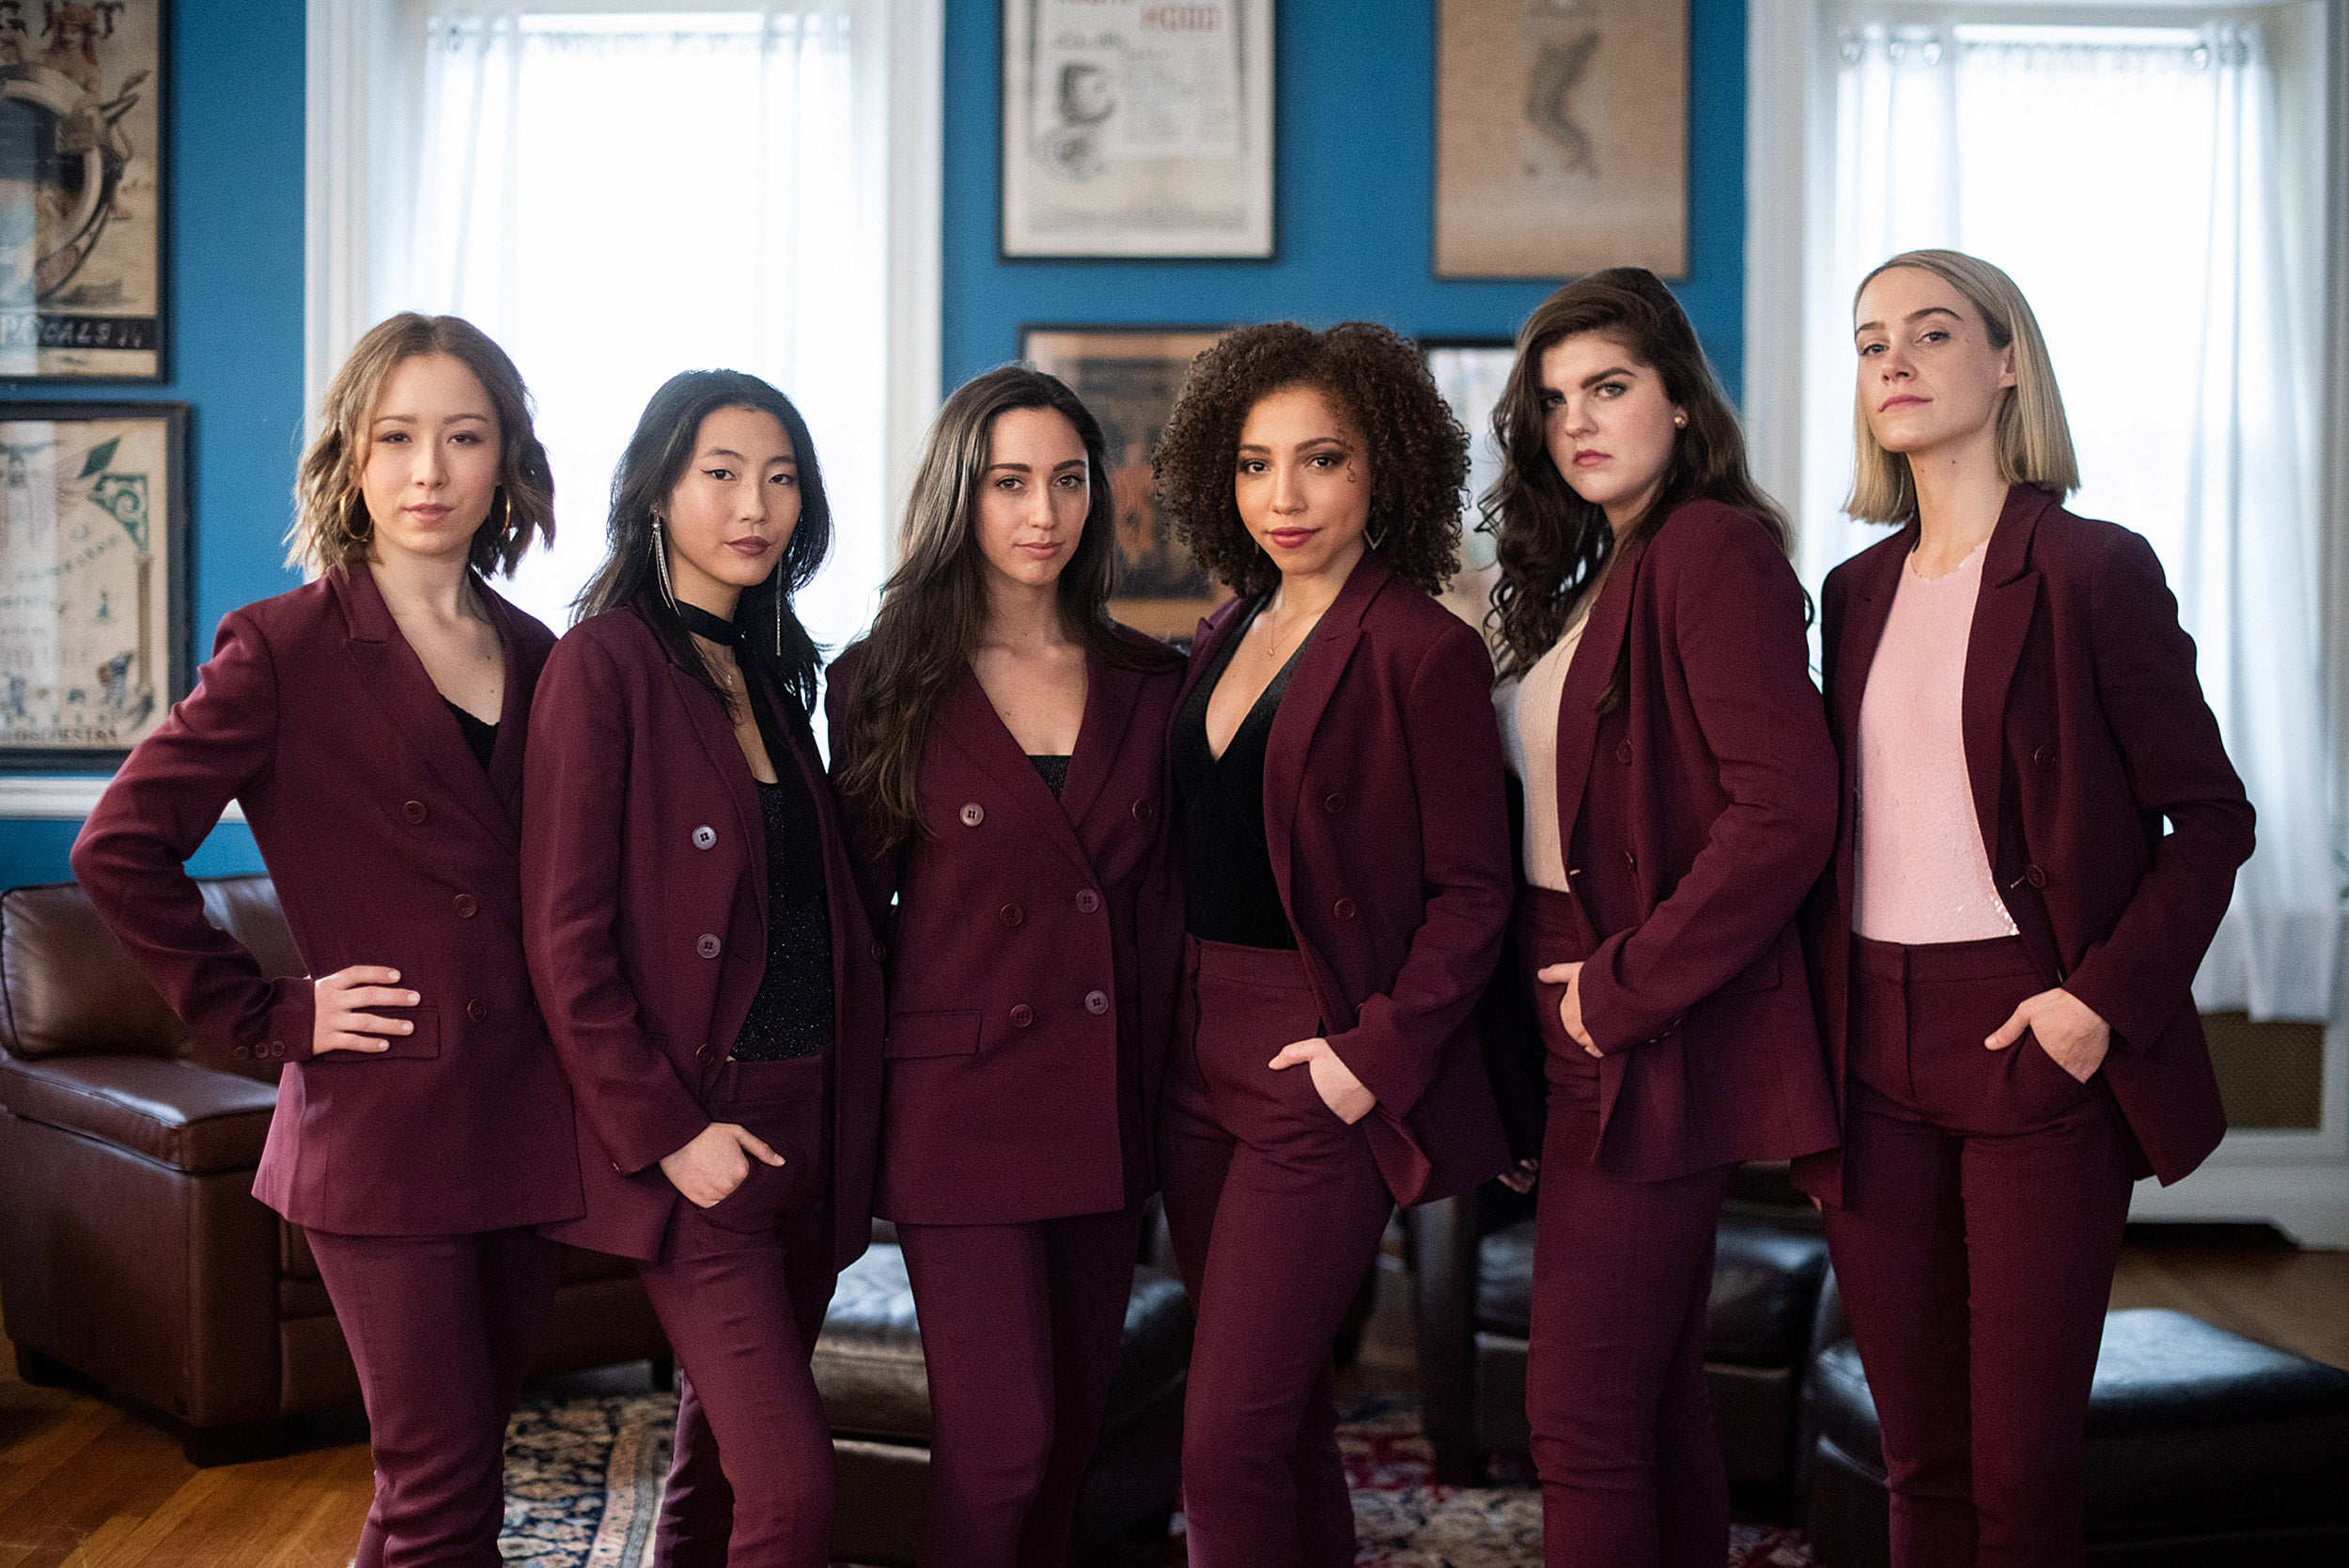 Celia Kenney '20, Shirley Chen '22, Laura Sky Herman '19, Ashley LaLonde '20, Elle Shaheen '20 Annabel O'Hagan '19.